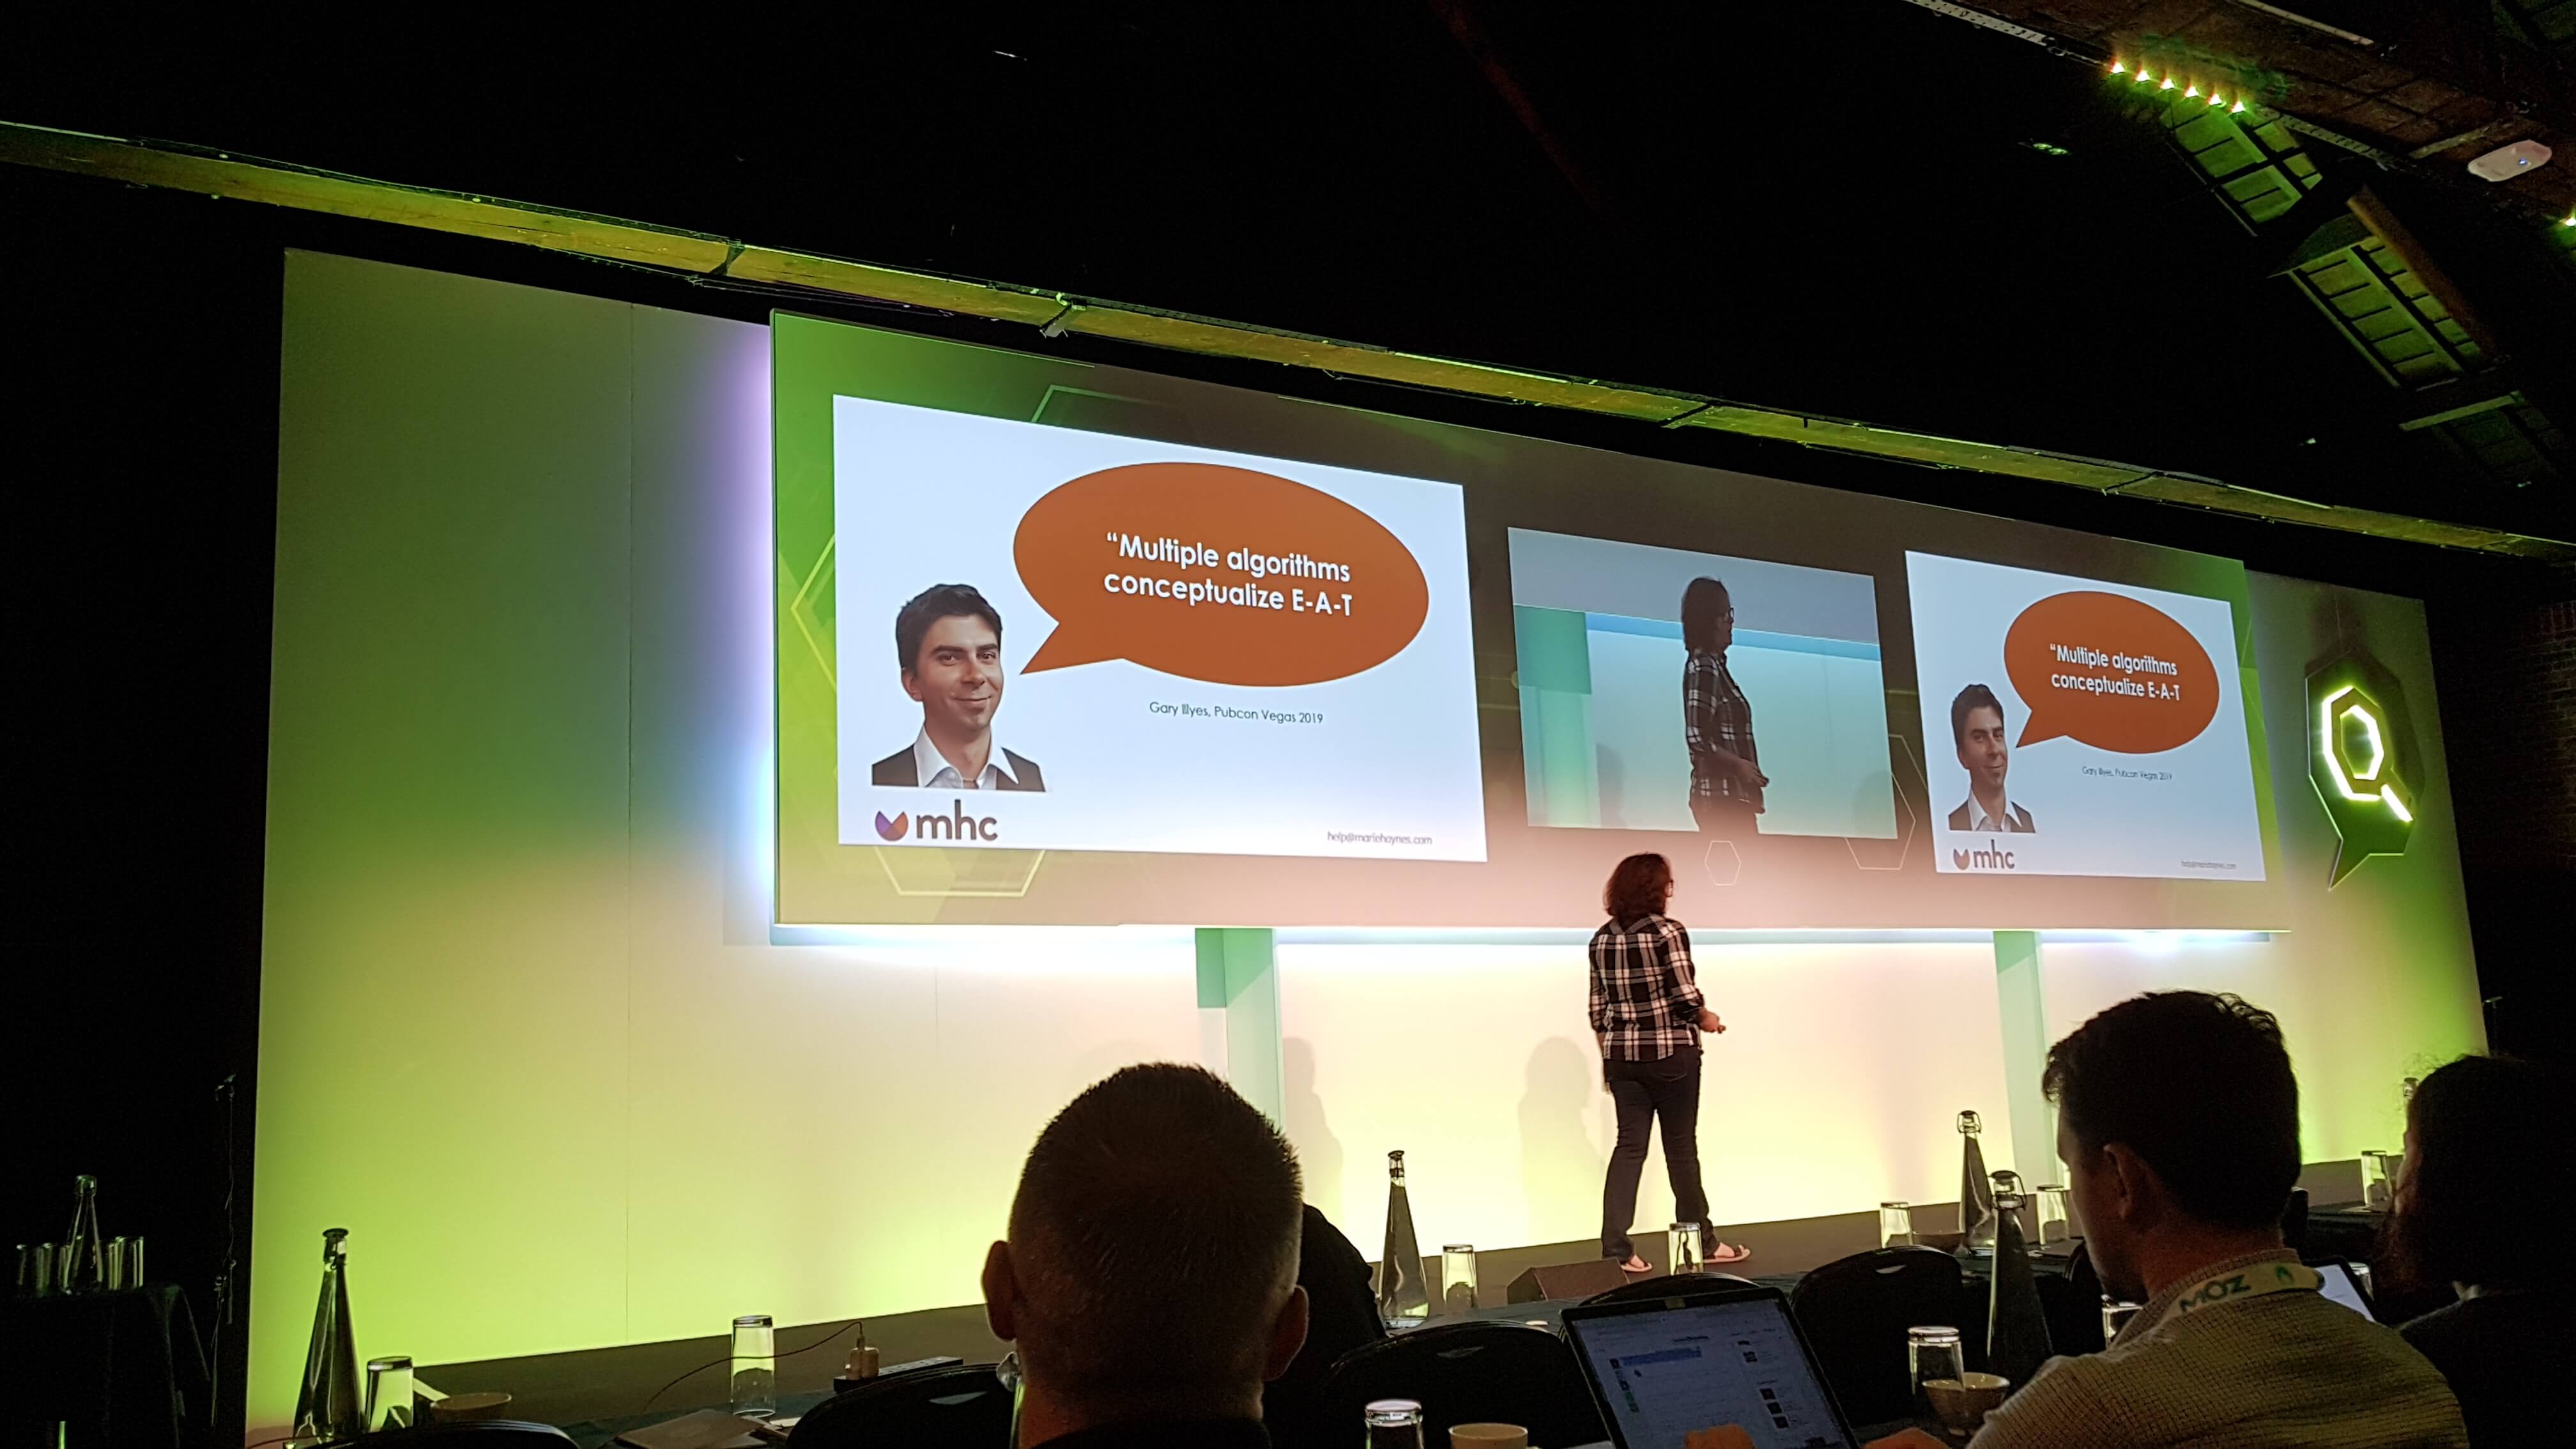 Marie Haynes über E-A-T auf der SearchLove in London